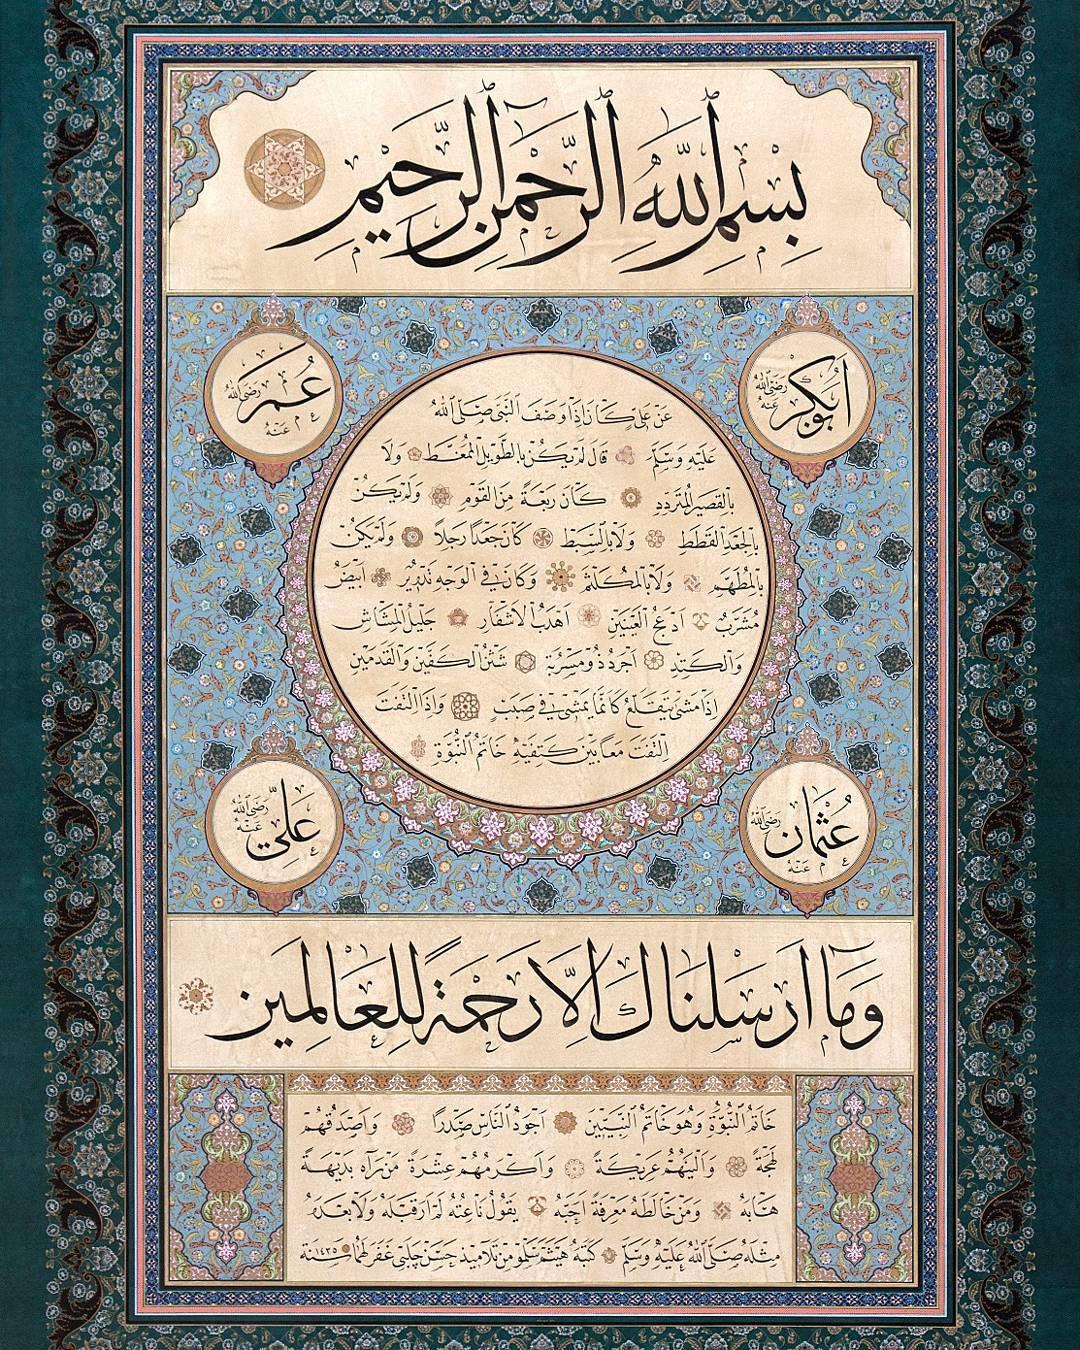 Works Calligraphy Haythamsalmo حلية شريفة كتبتها منذ اربع سنوات  وكان لي الشرف بانها في احد مساجد اسطنبول…. 164